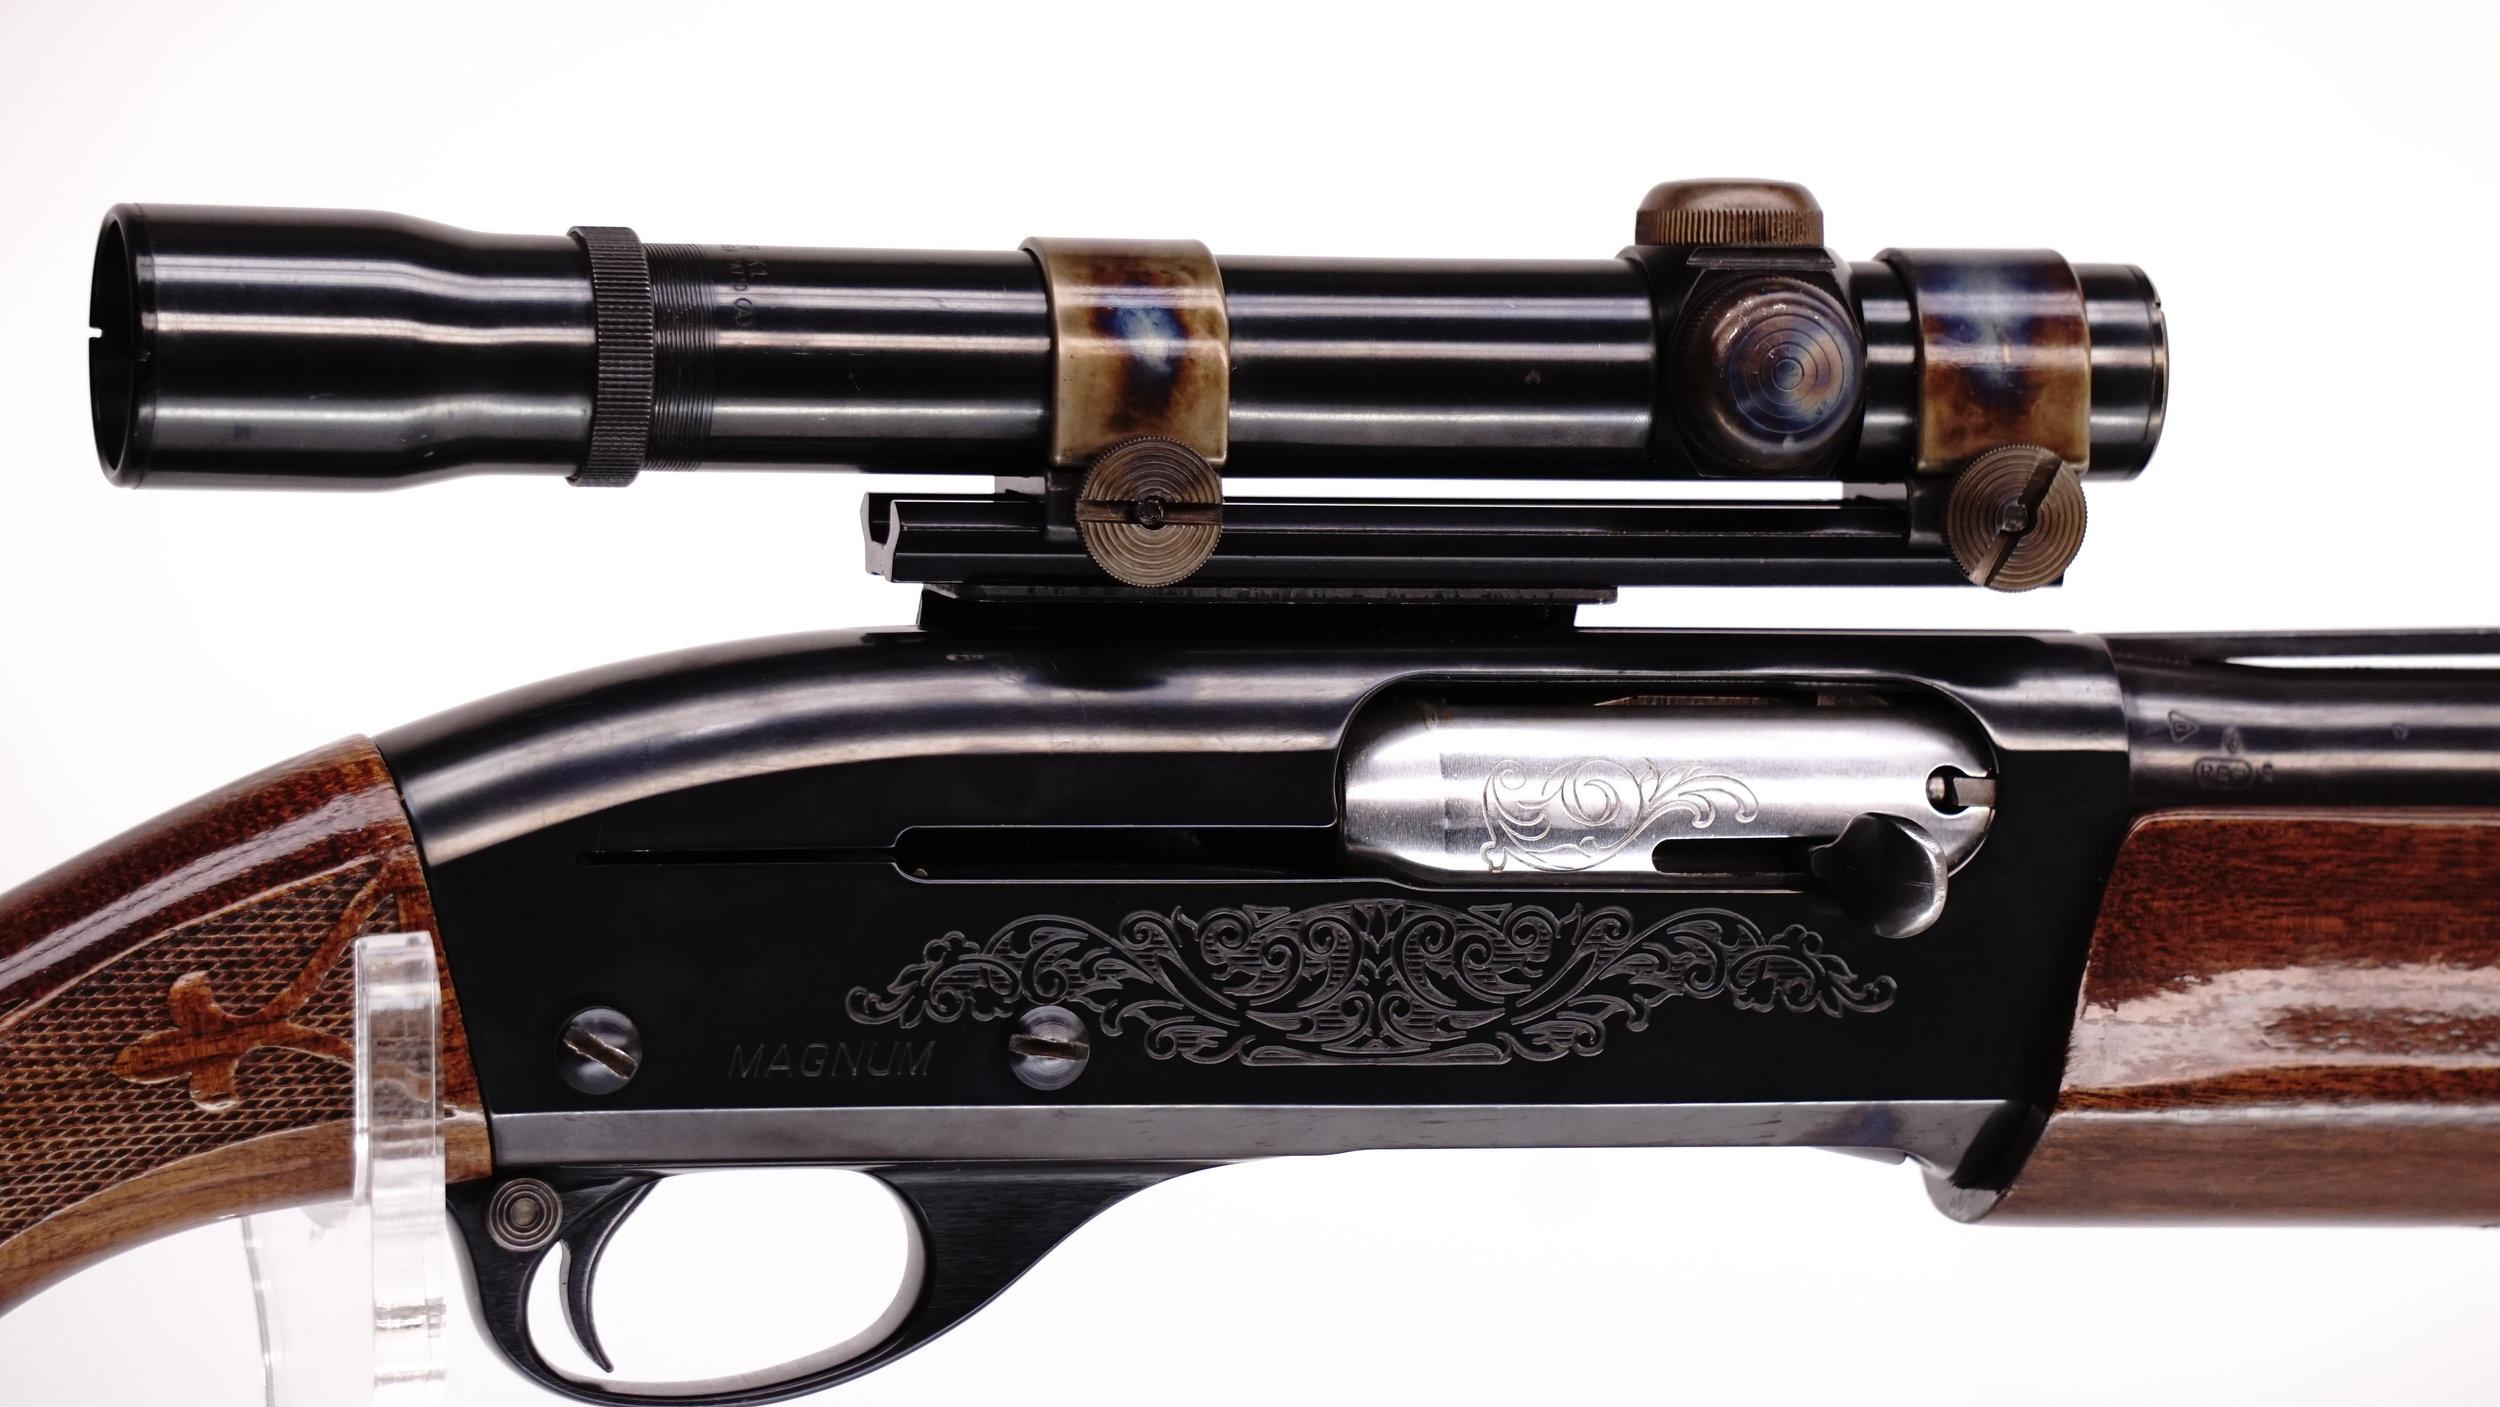 1978 Remington Model 1100 Magnum/Weaver 1100 Mount with Weaver K1 Crosshair/Dot reticle.